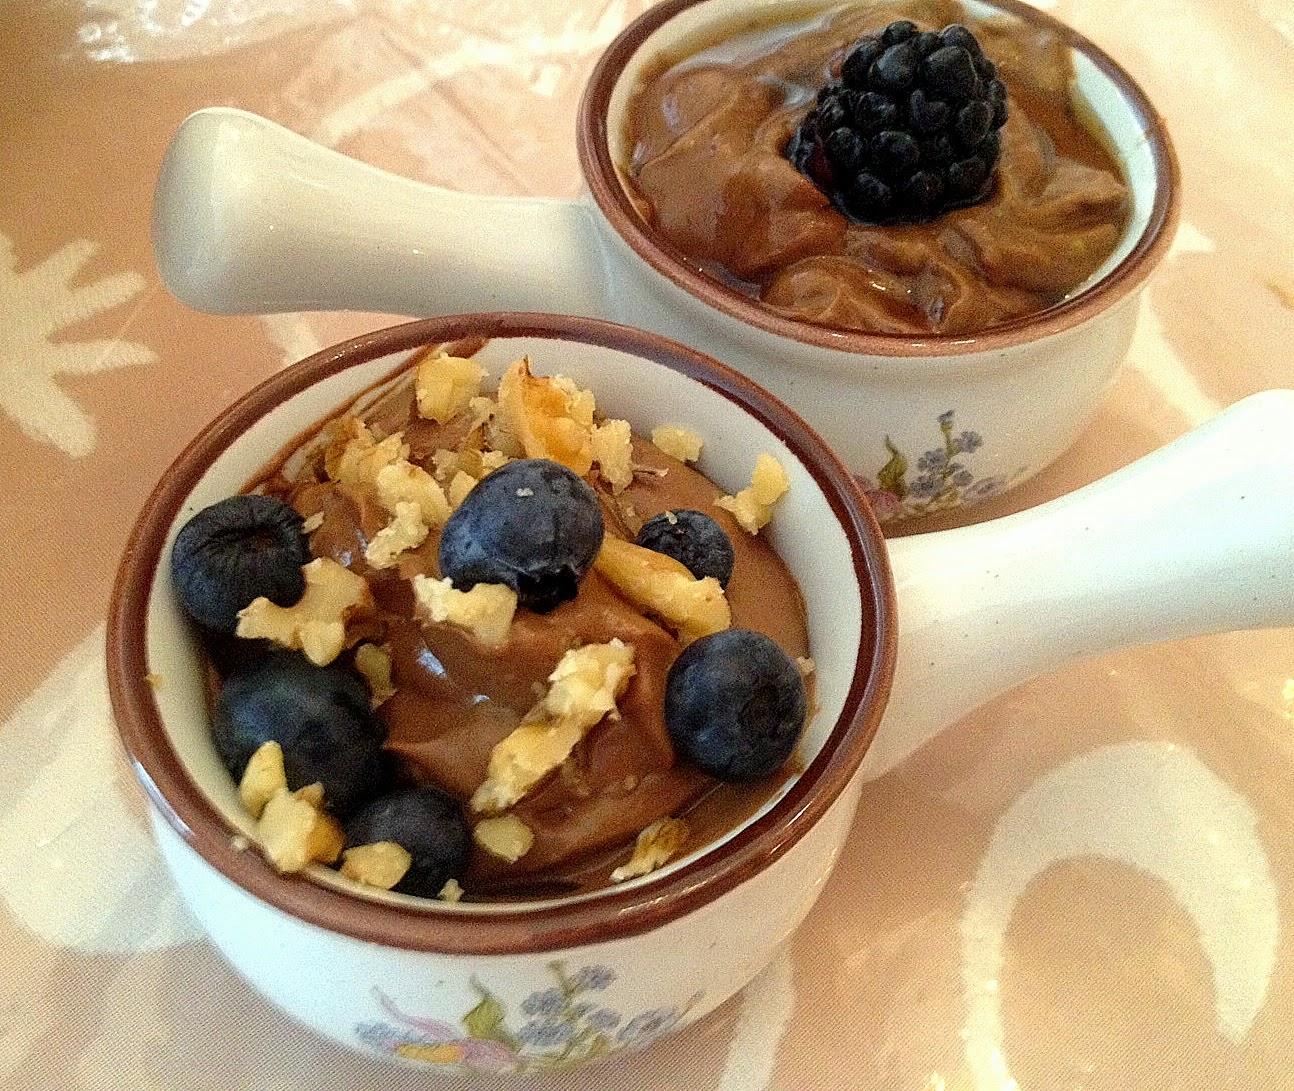 Resep Honey Chocolate Mousse Yummy